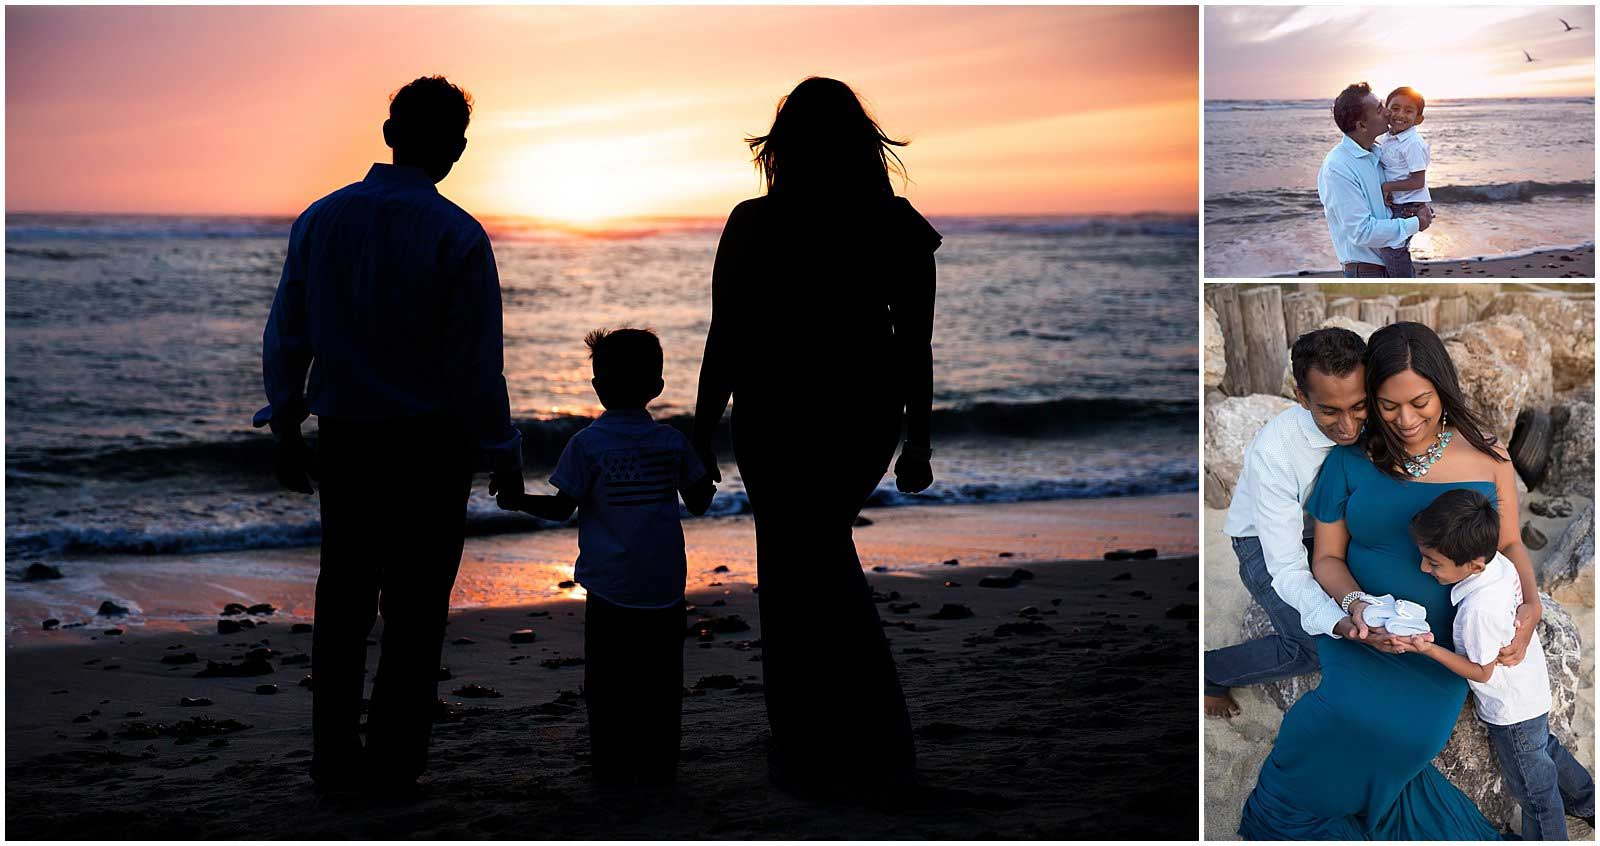 sunset at half moon bay maternity photography